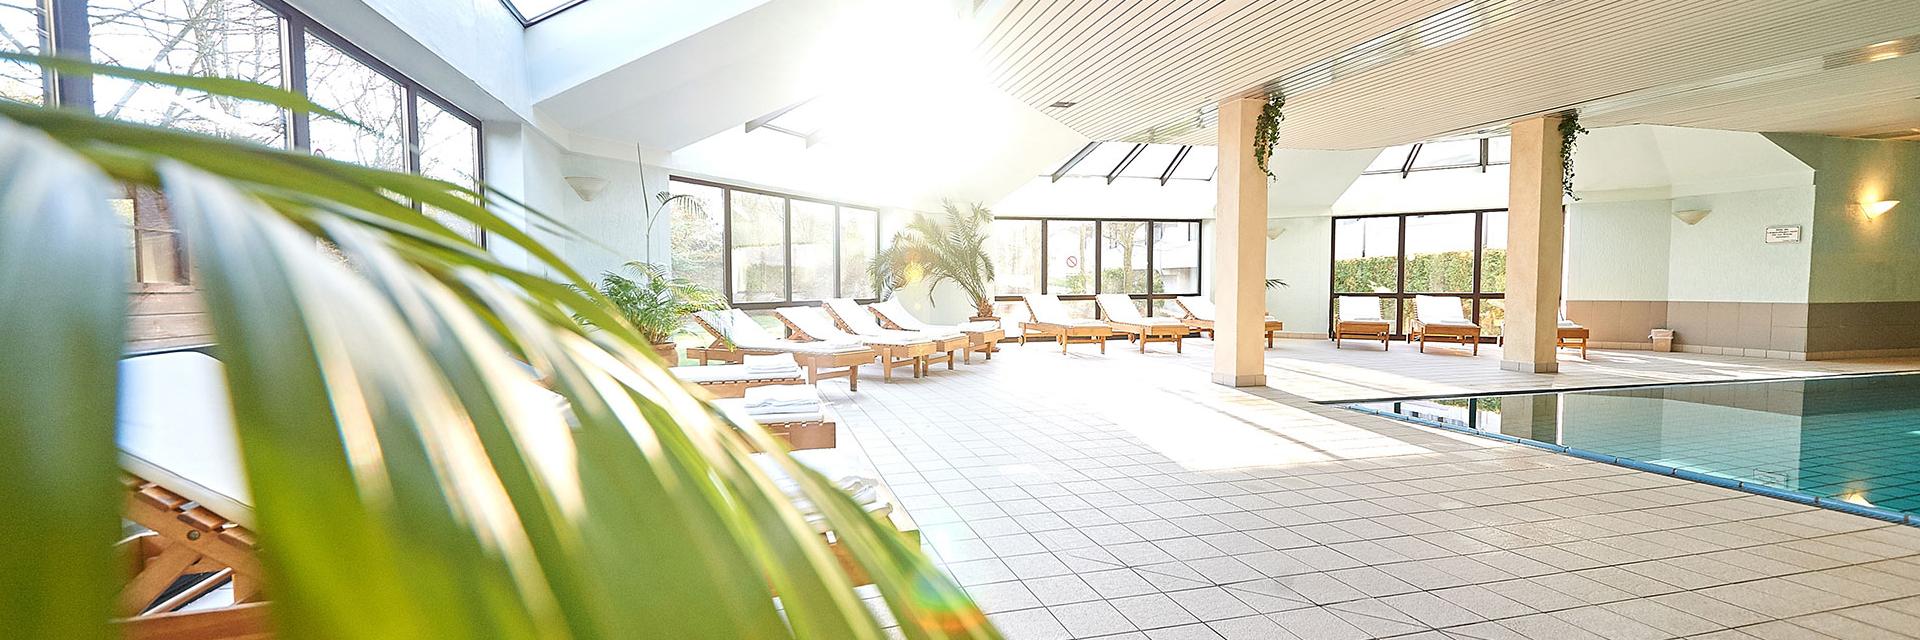 hotel moselpark